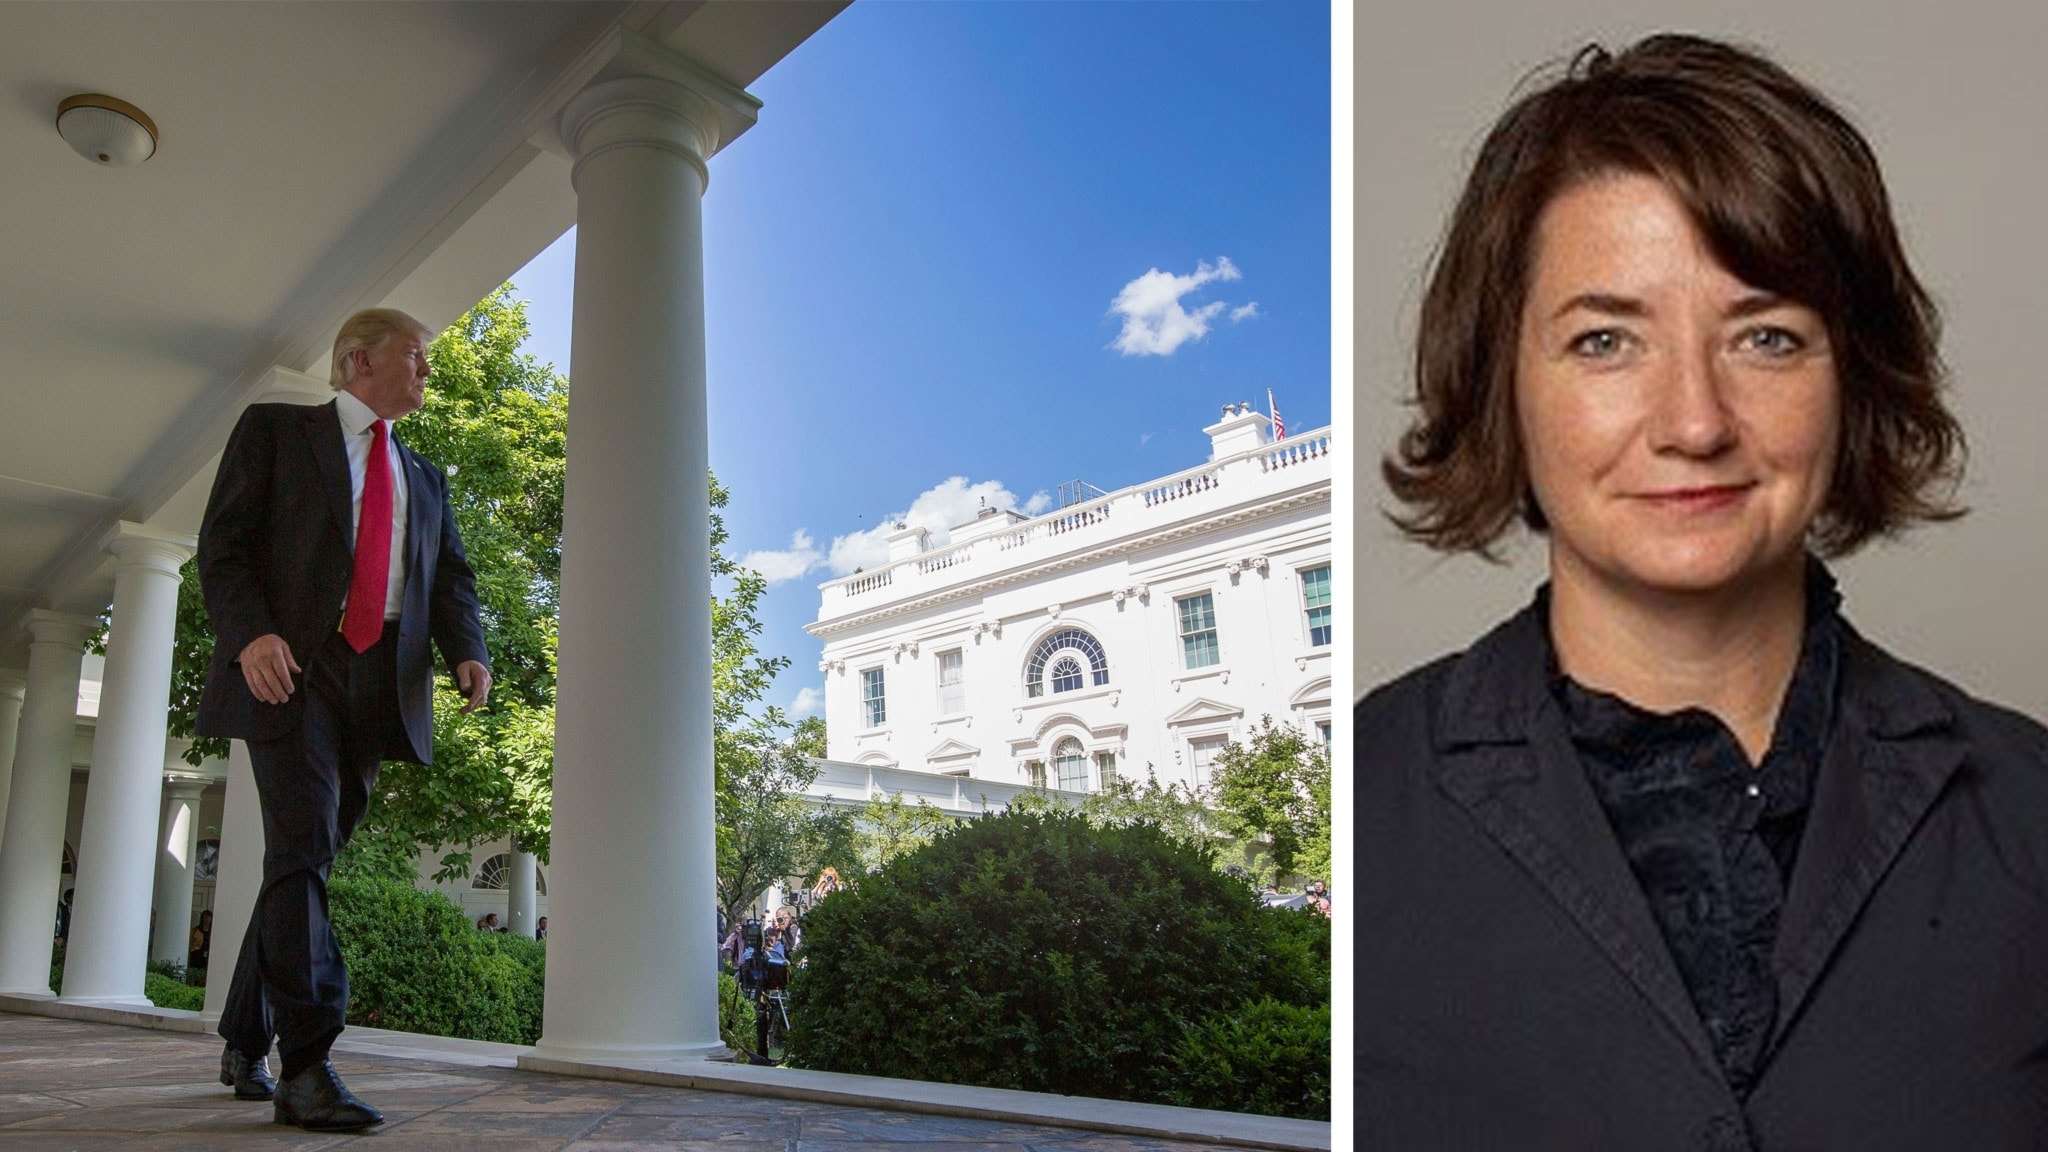 Uppgifter: Karin Olofsdotter ny ambassadör i Washington - Nyheter (Ekot)